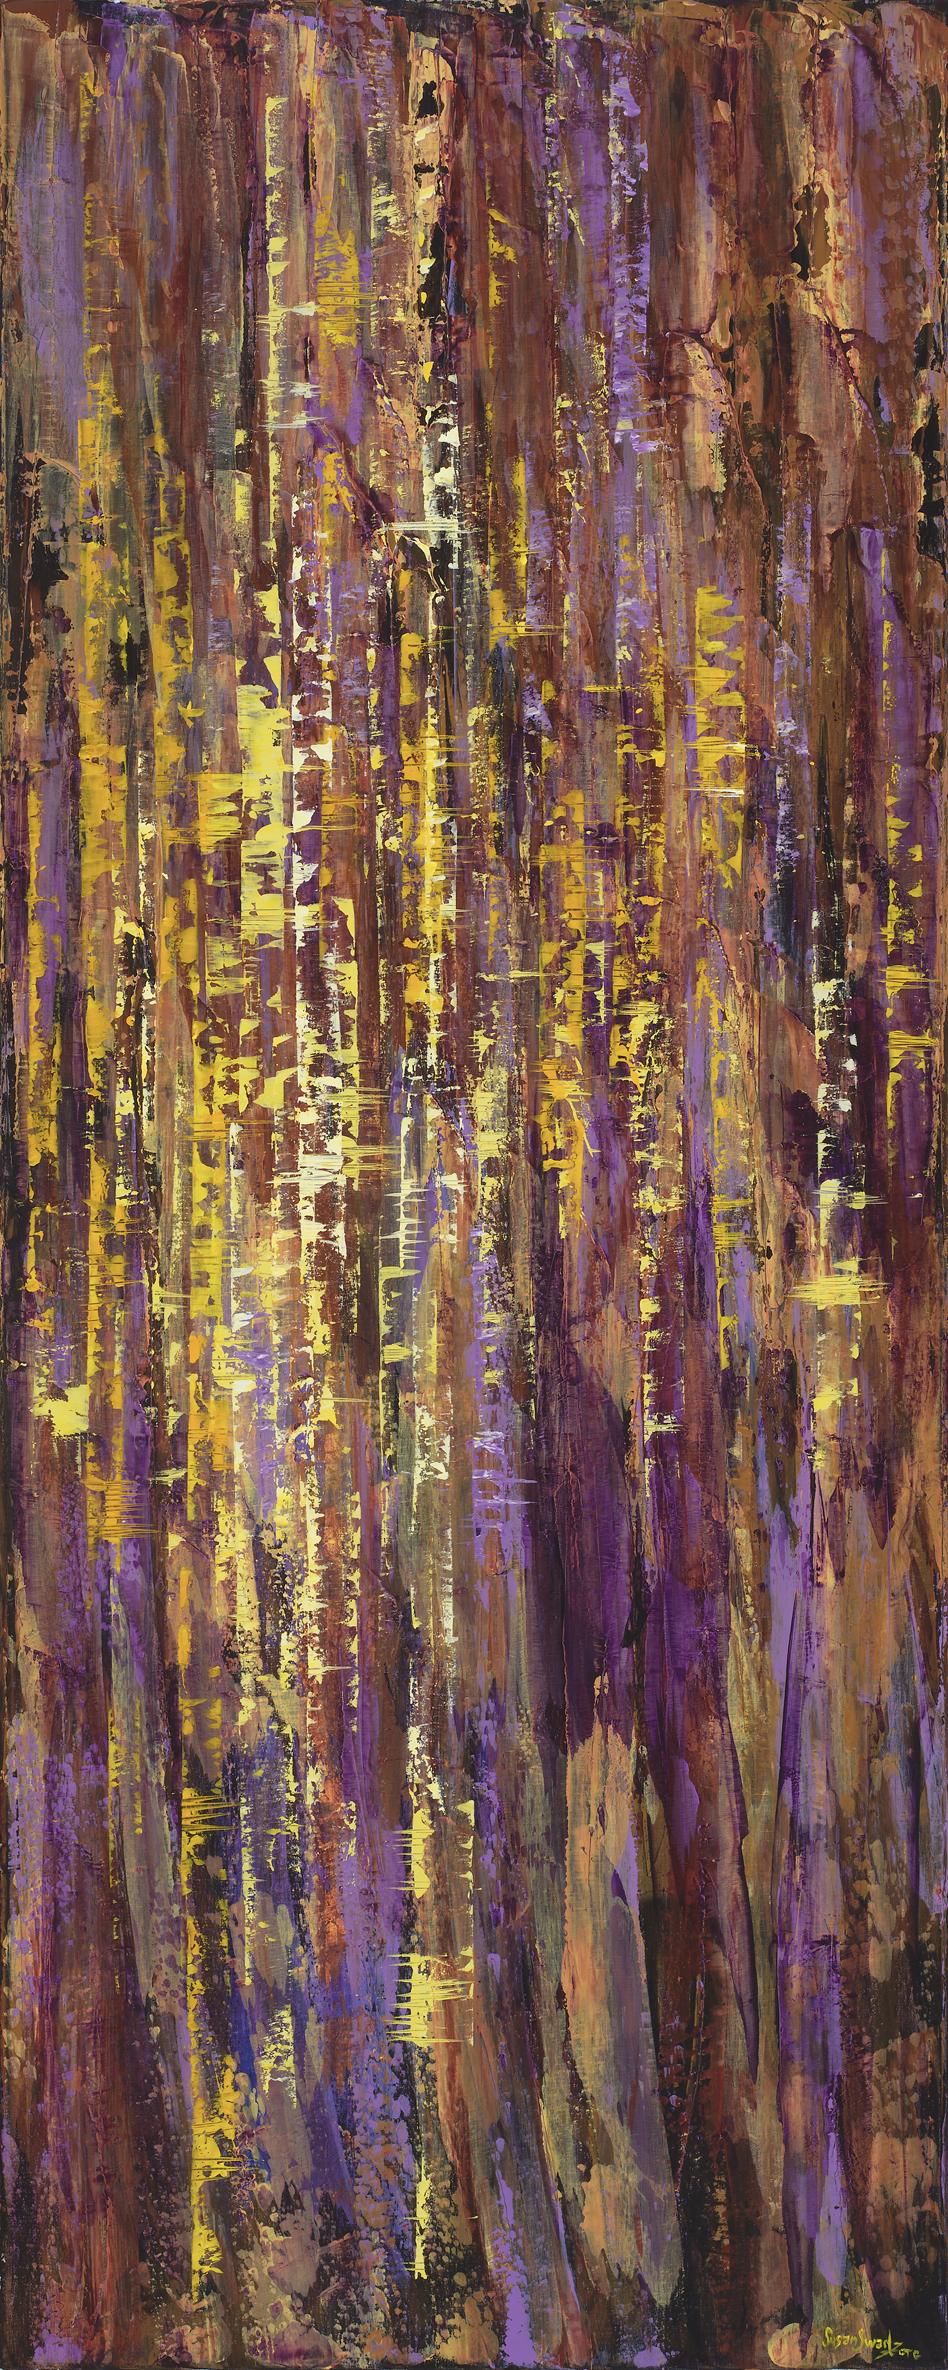 Landscape of Resonances 005 24x60.png